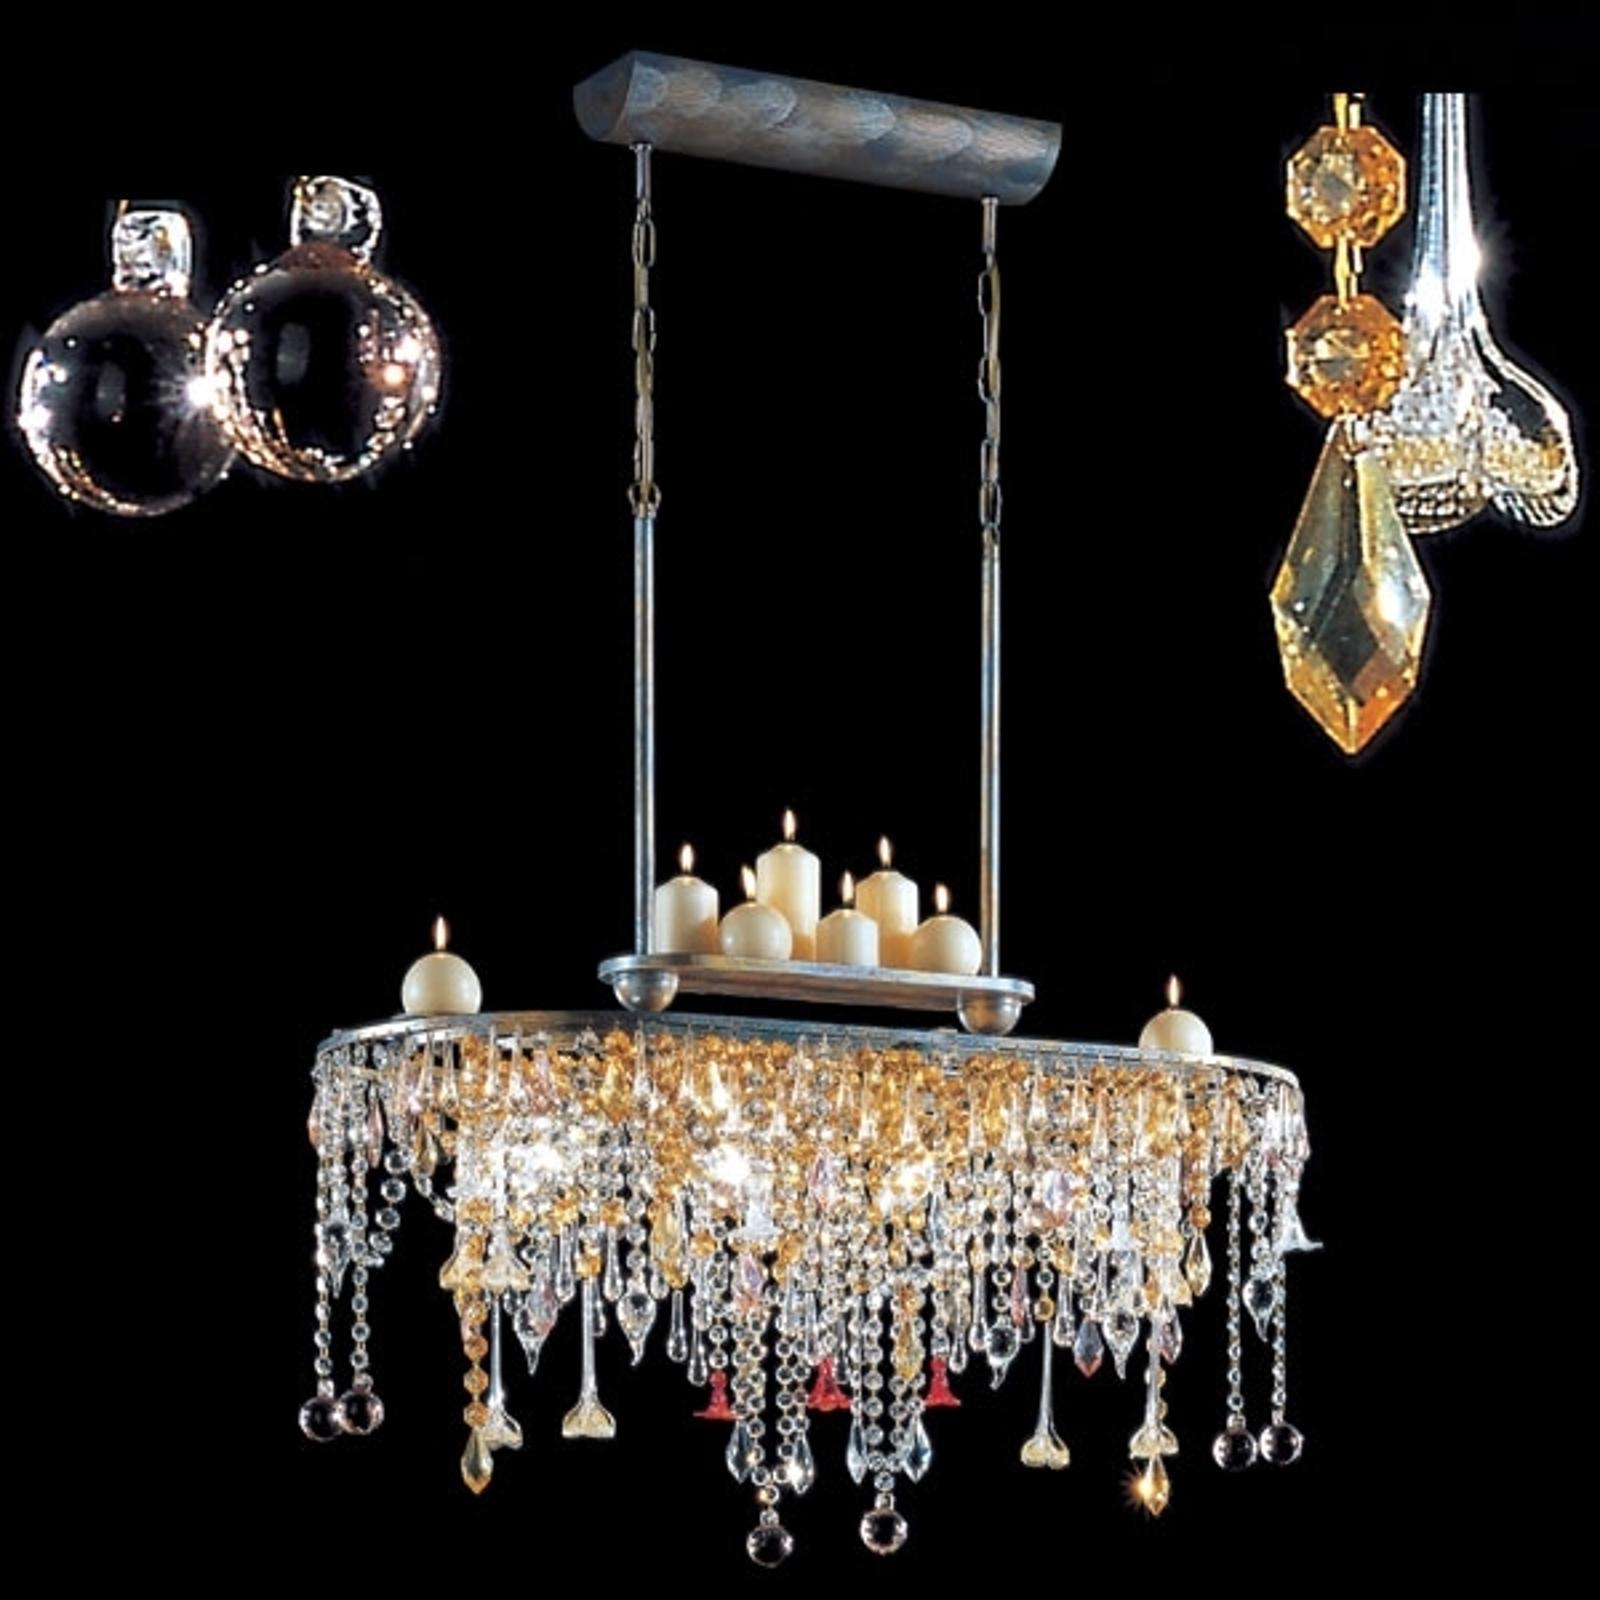 GOLDEN DREAM lampe med bjælkeform og kertelys